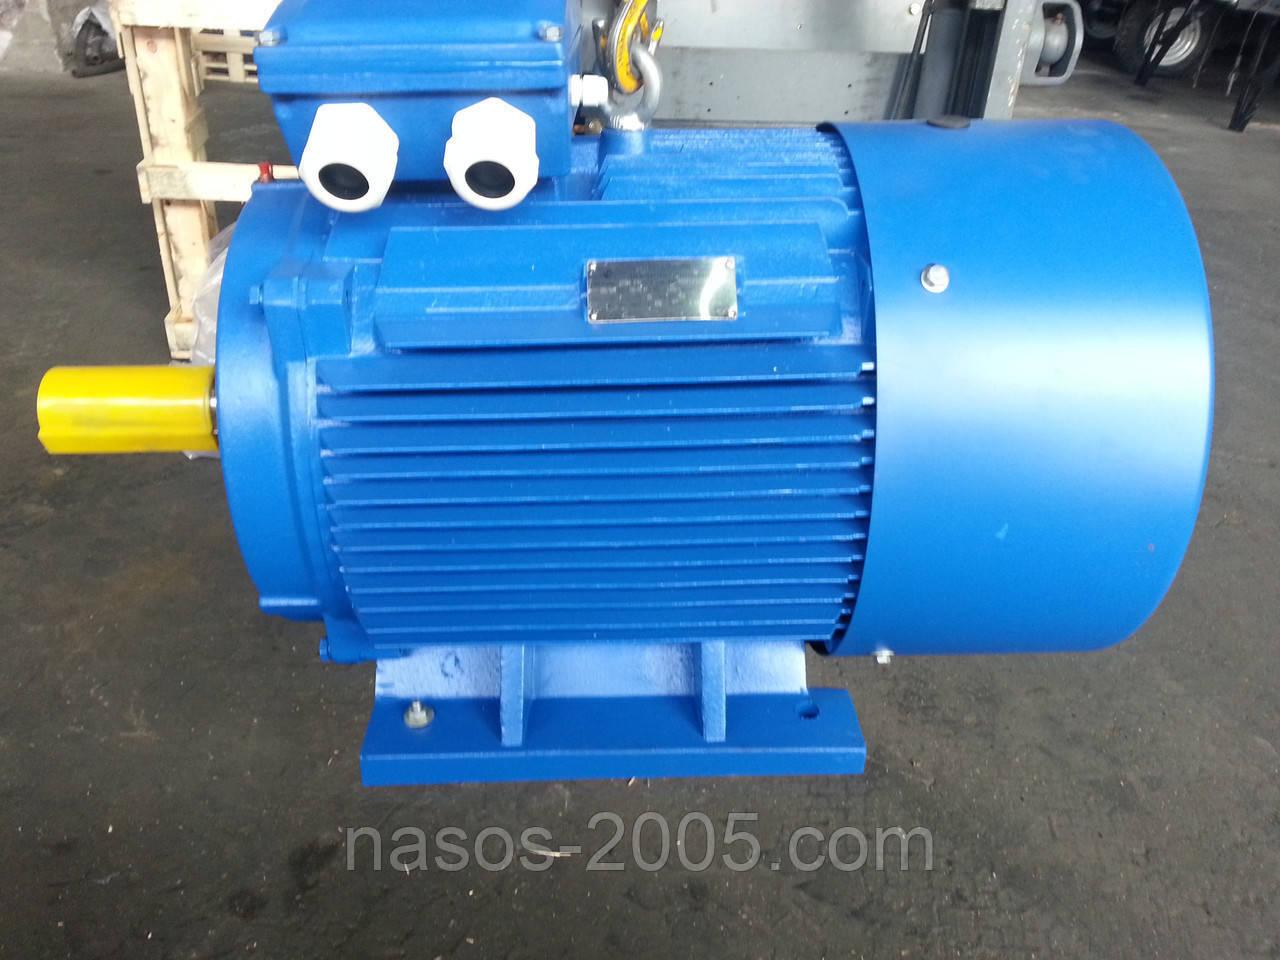 Электродвигатель АИР 160 S6 11 кВт 1000 об/мин